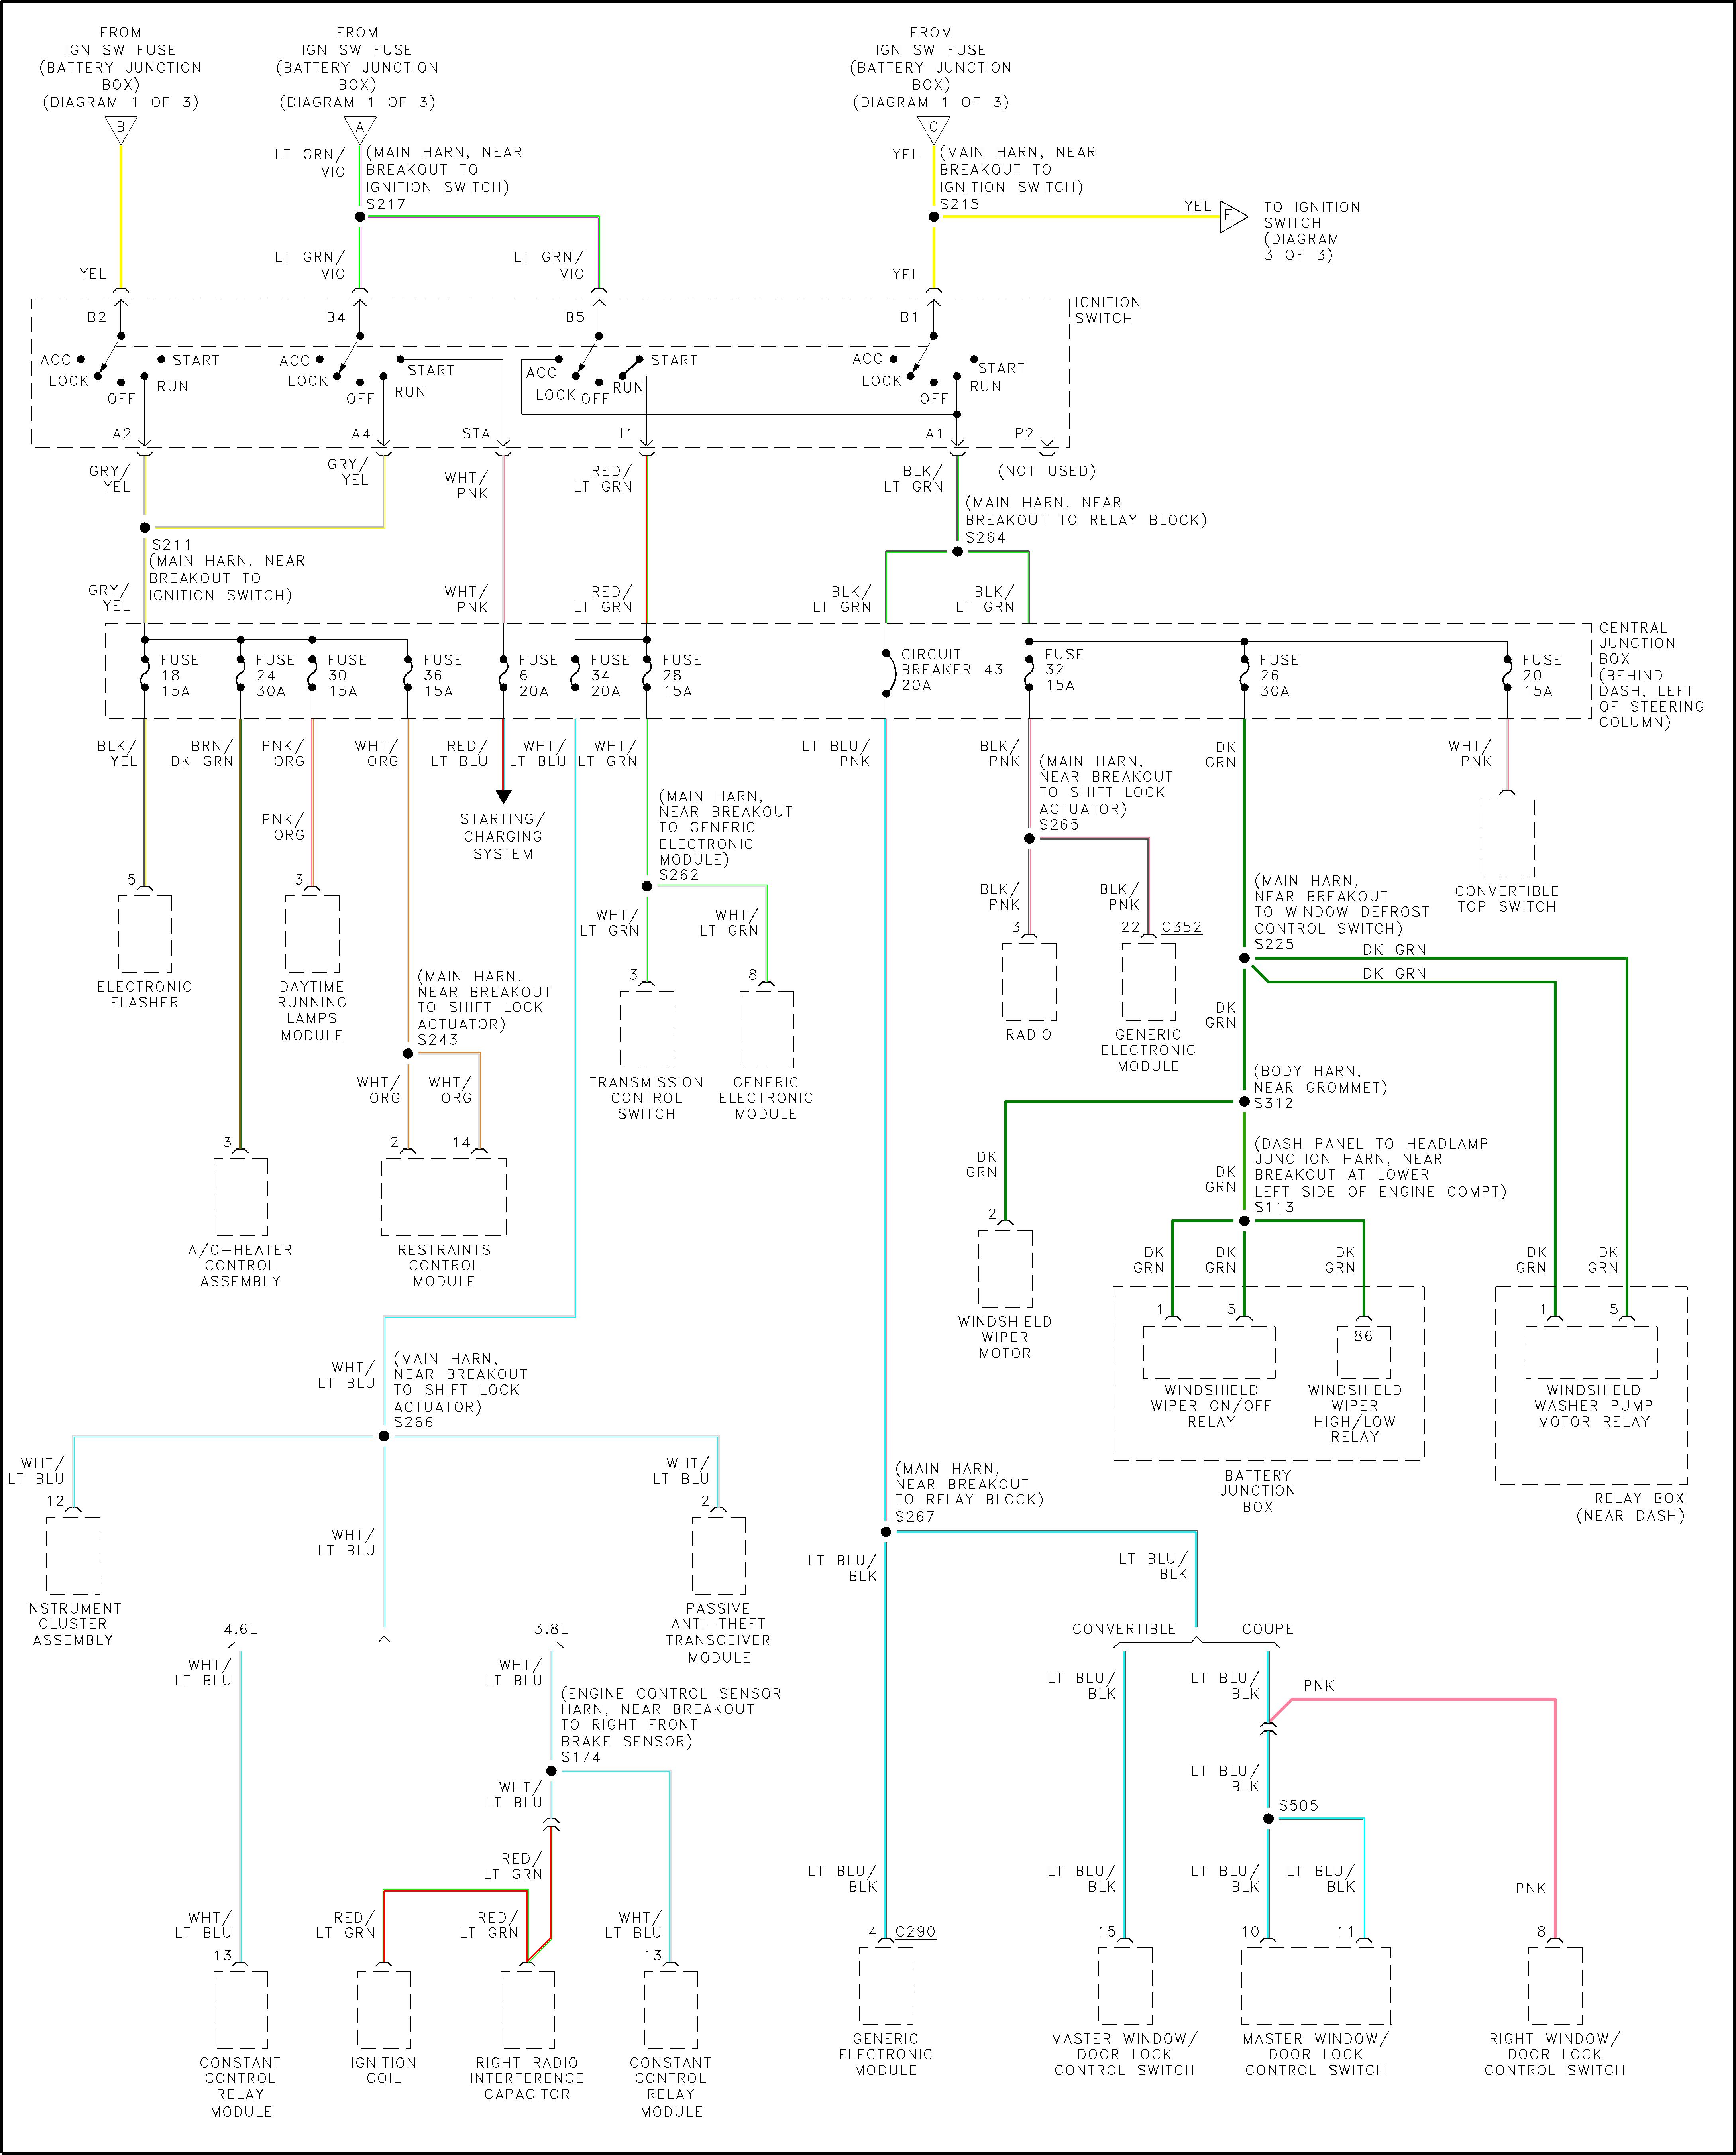 02558912-f528-40d7-9d0d-f14d258b83bc_ignition switch.png